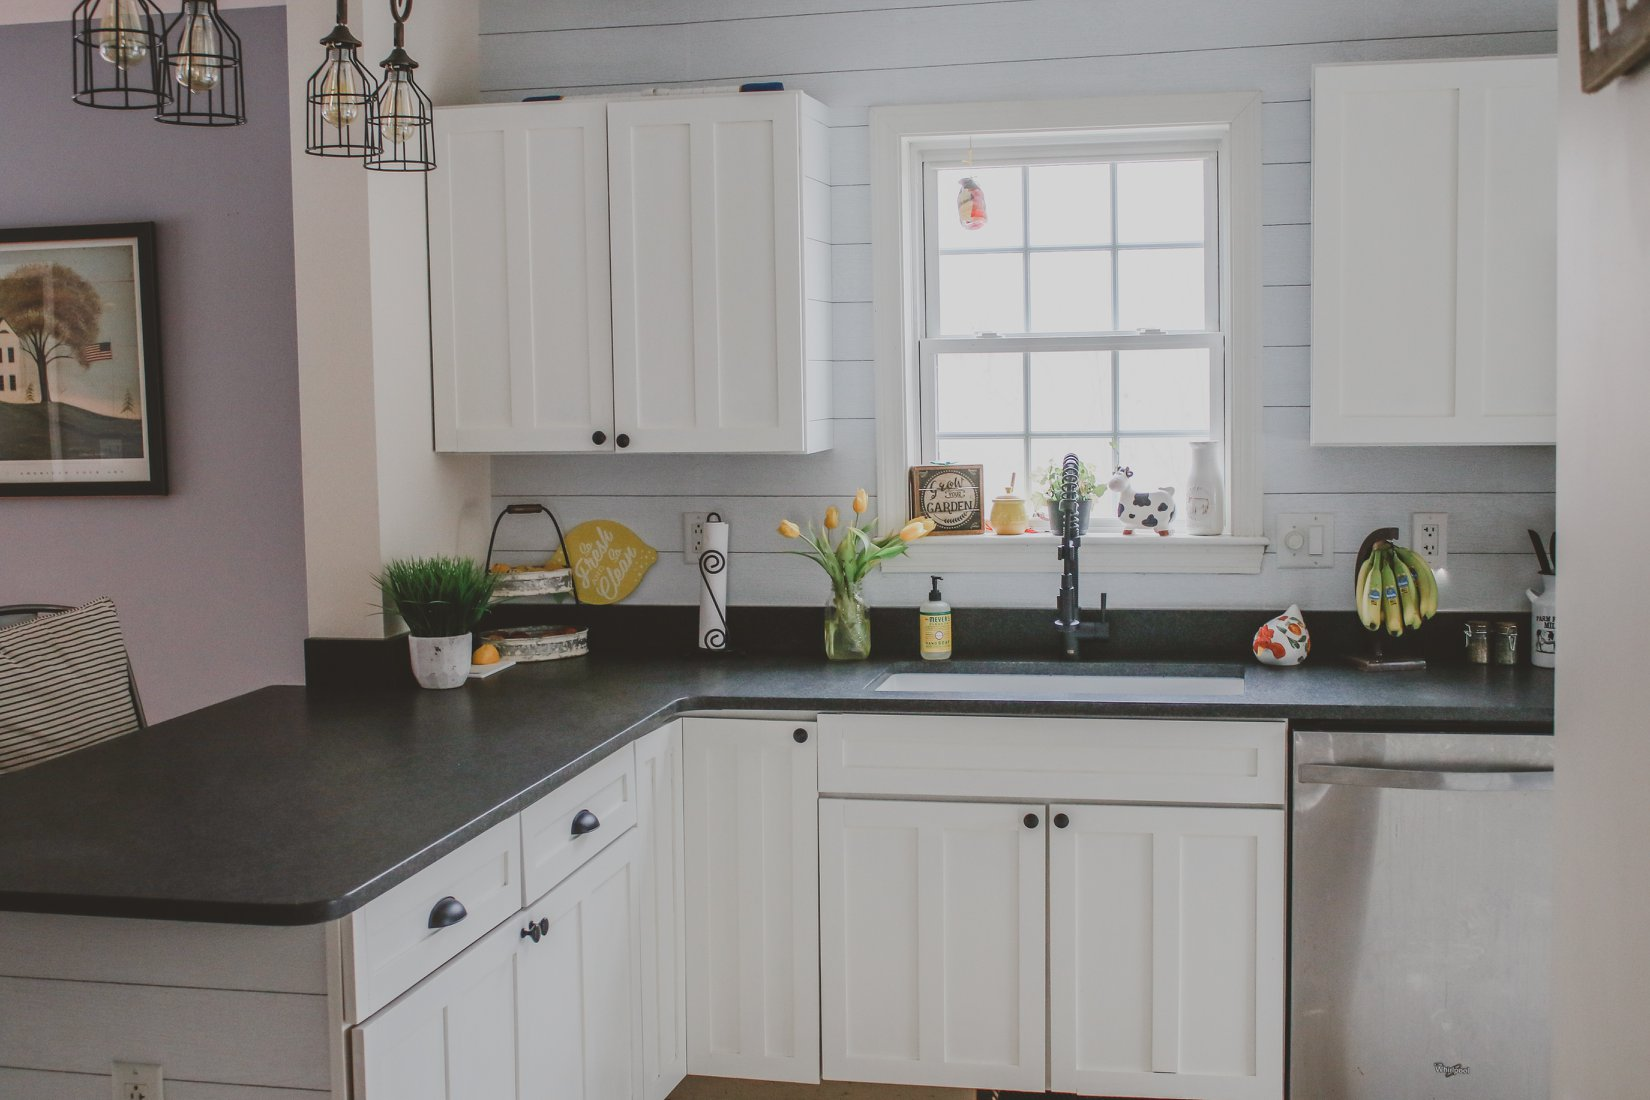 New Hampshire Granite Countertops Starting At 29 99 Per Sf Free Sink